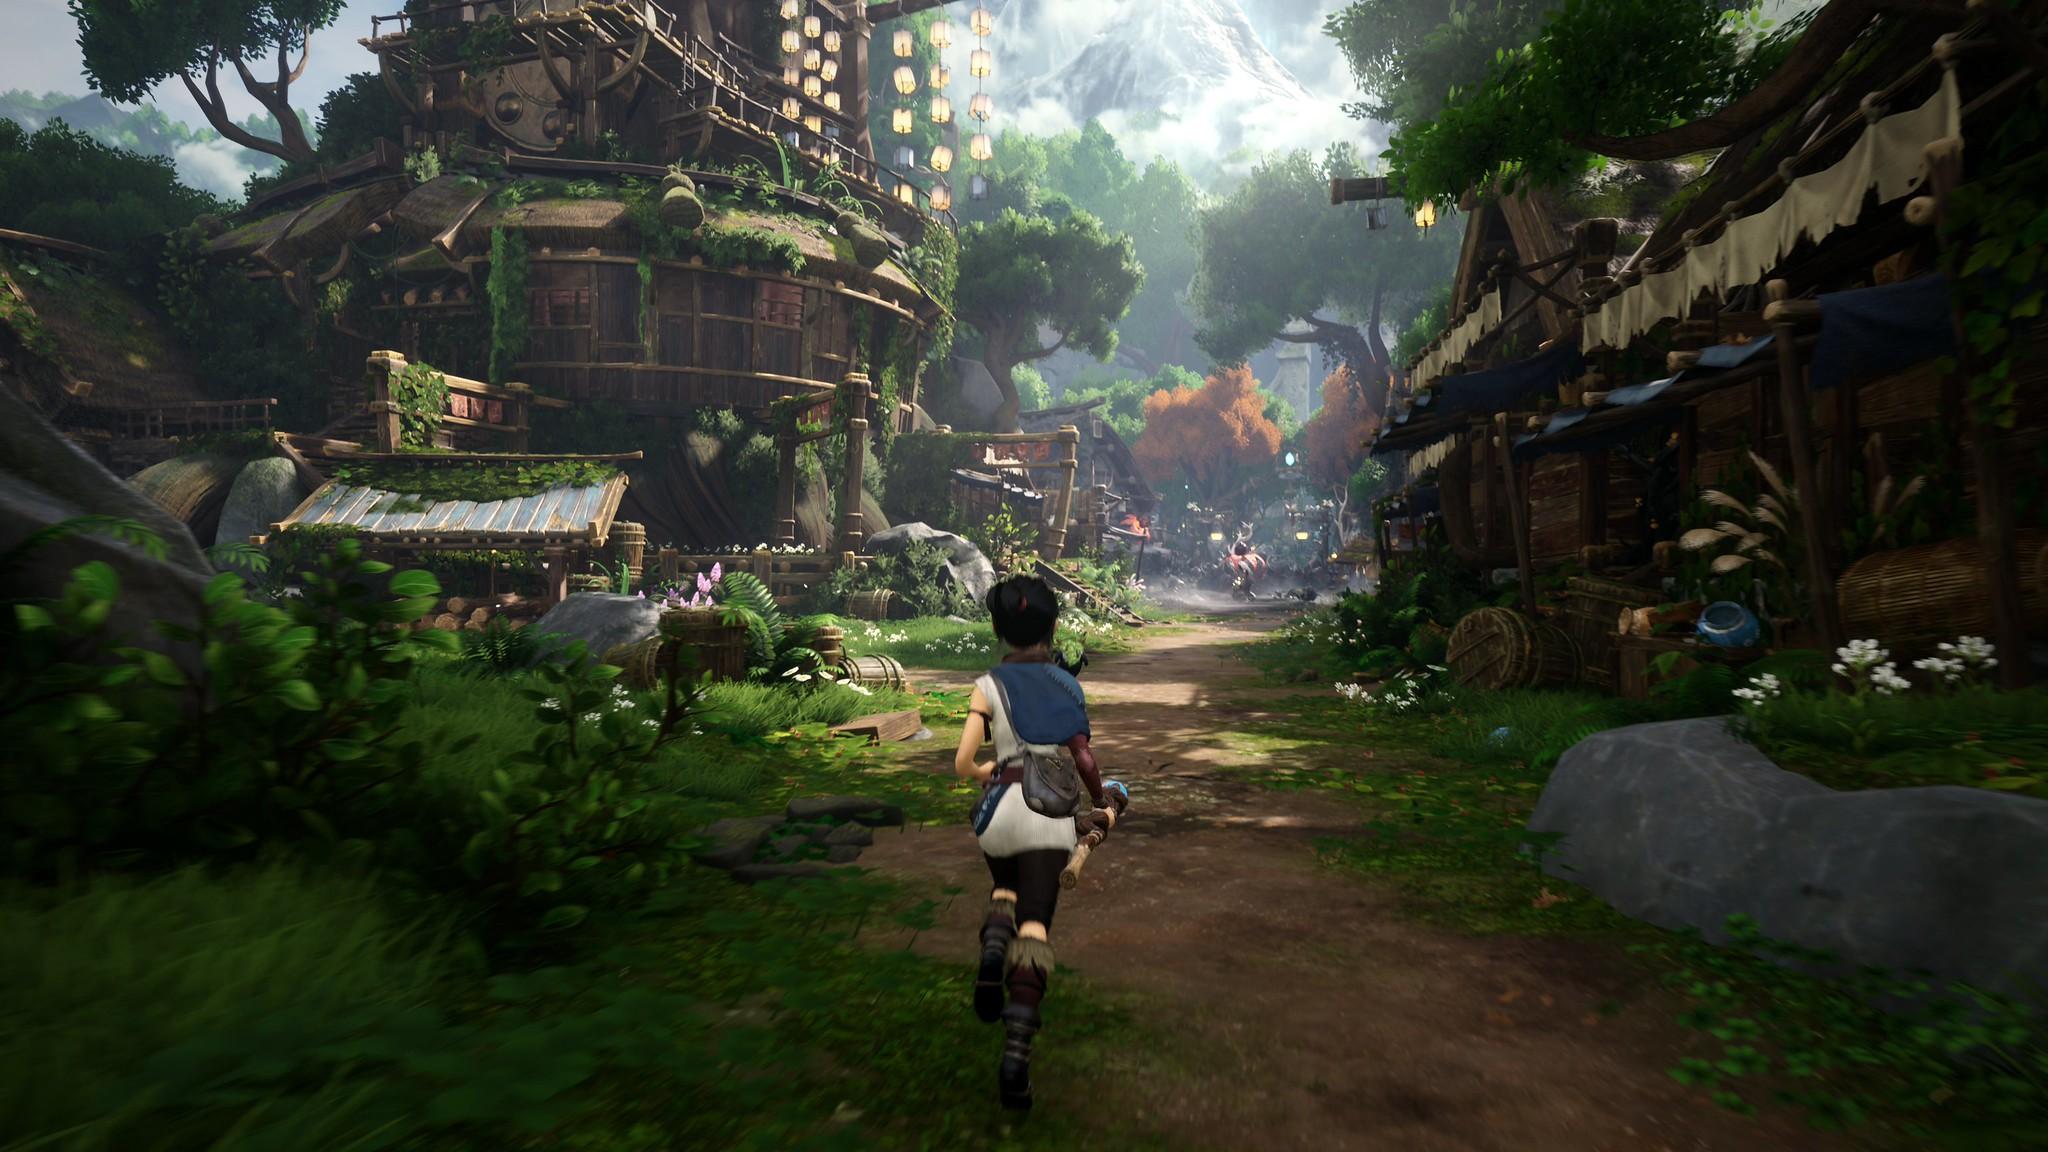 Summer of Gaming 2020   اطلاعات جدیدی به همراه تریلری از گیمپلی Kena: Bridge of Spirits منتشر شد؛ فضای نه چندان زیاد مورد نیاز بازی